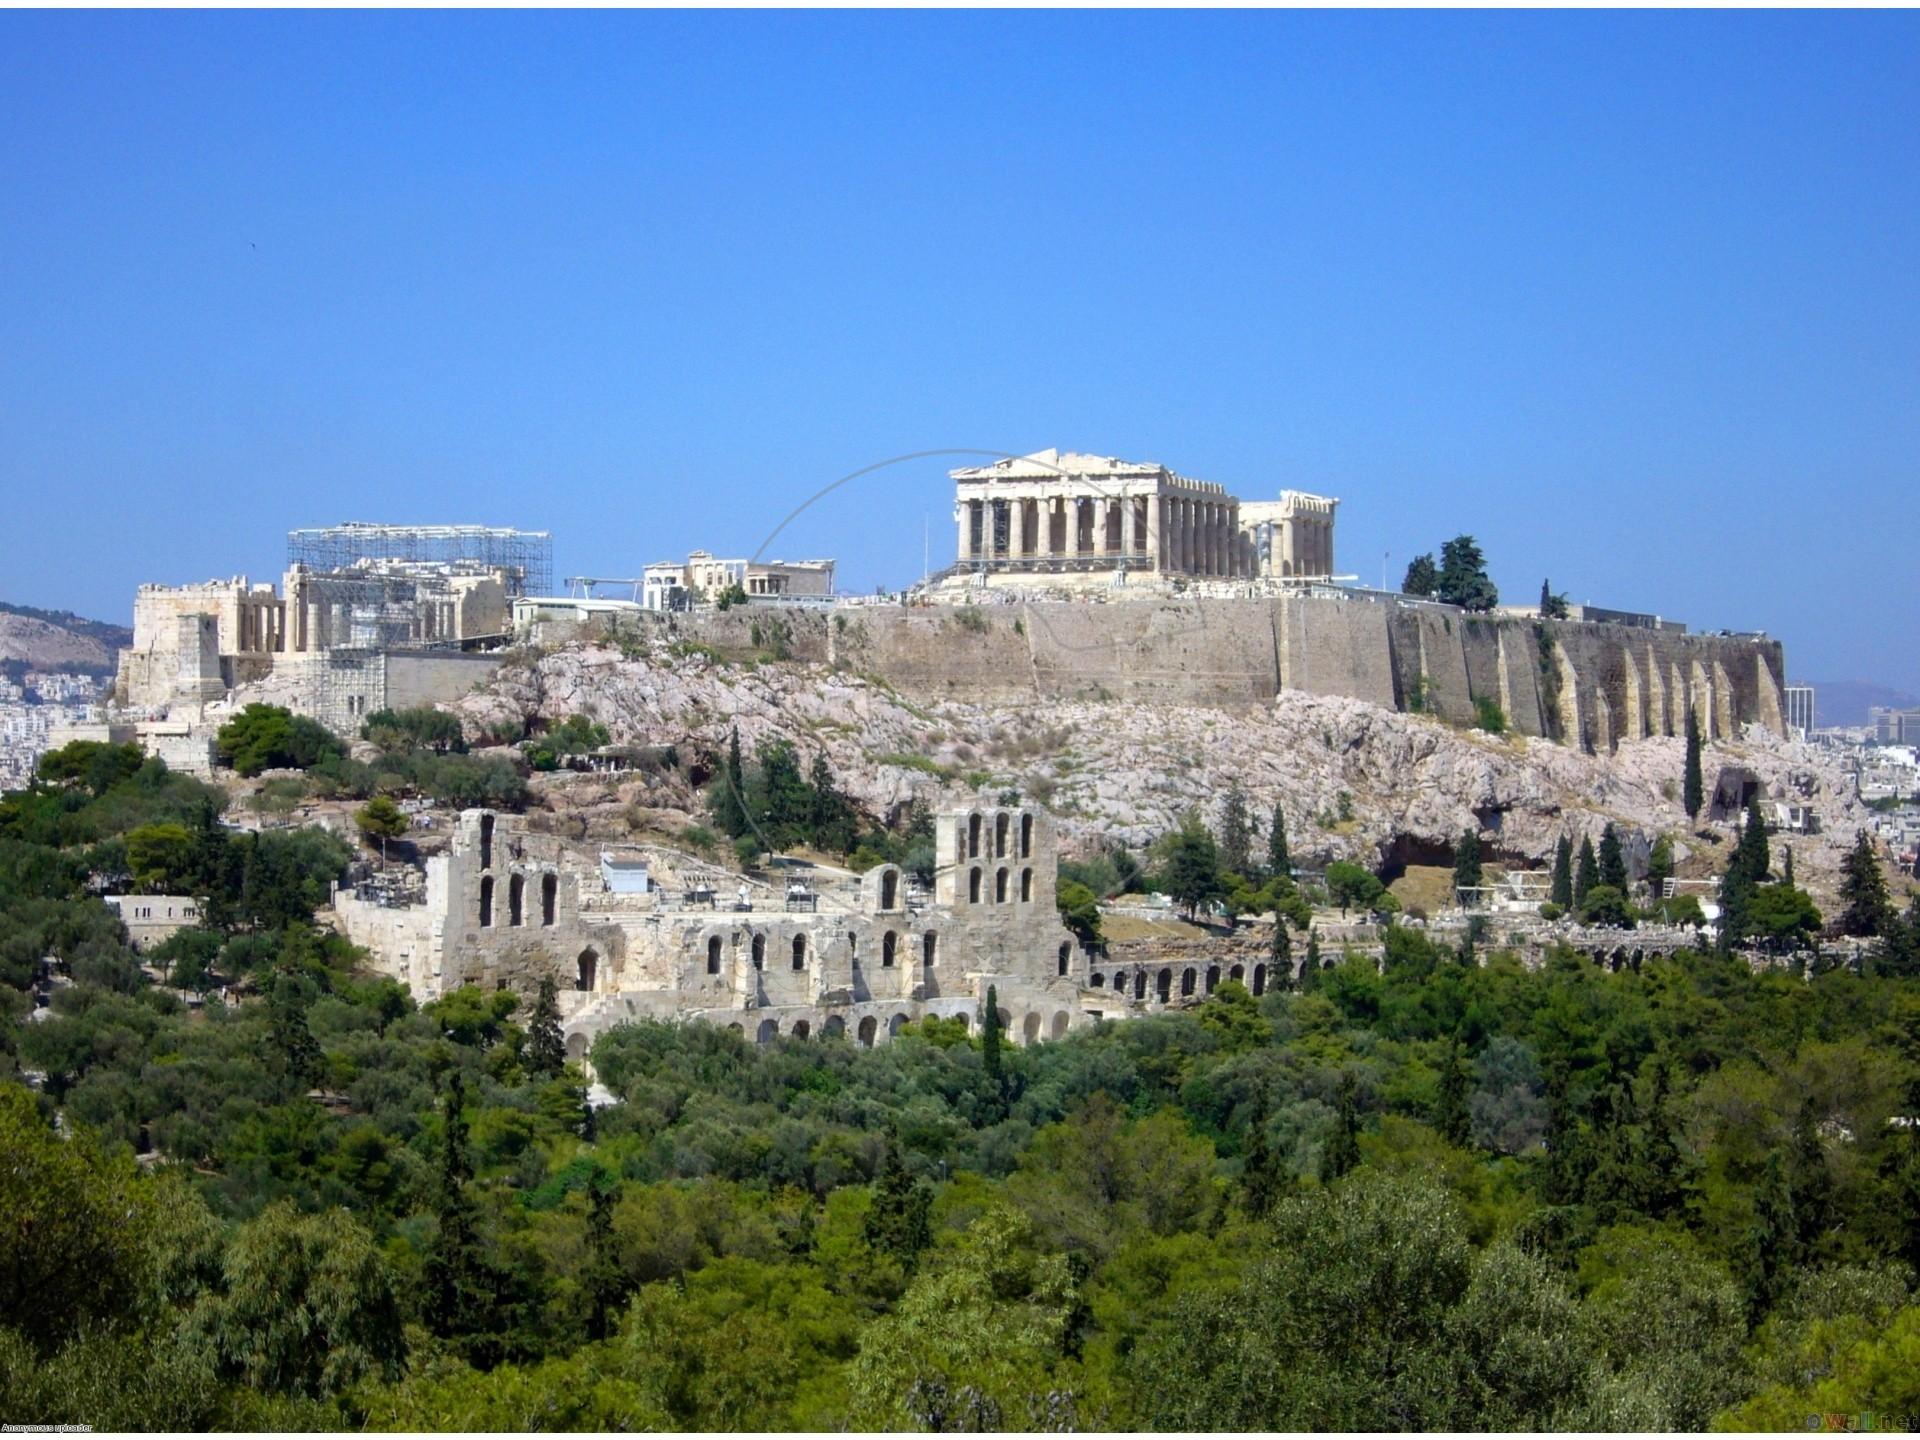 acropolis_athens_grece_wallpaper-1920x1440